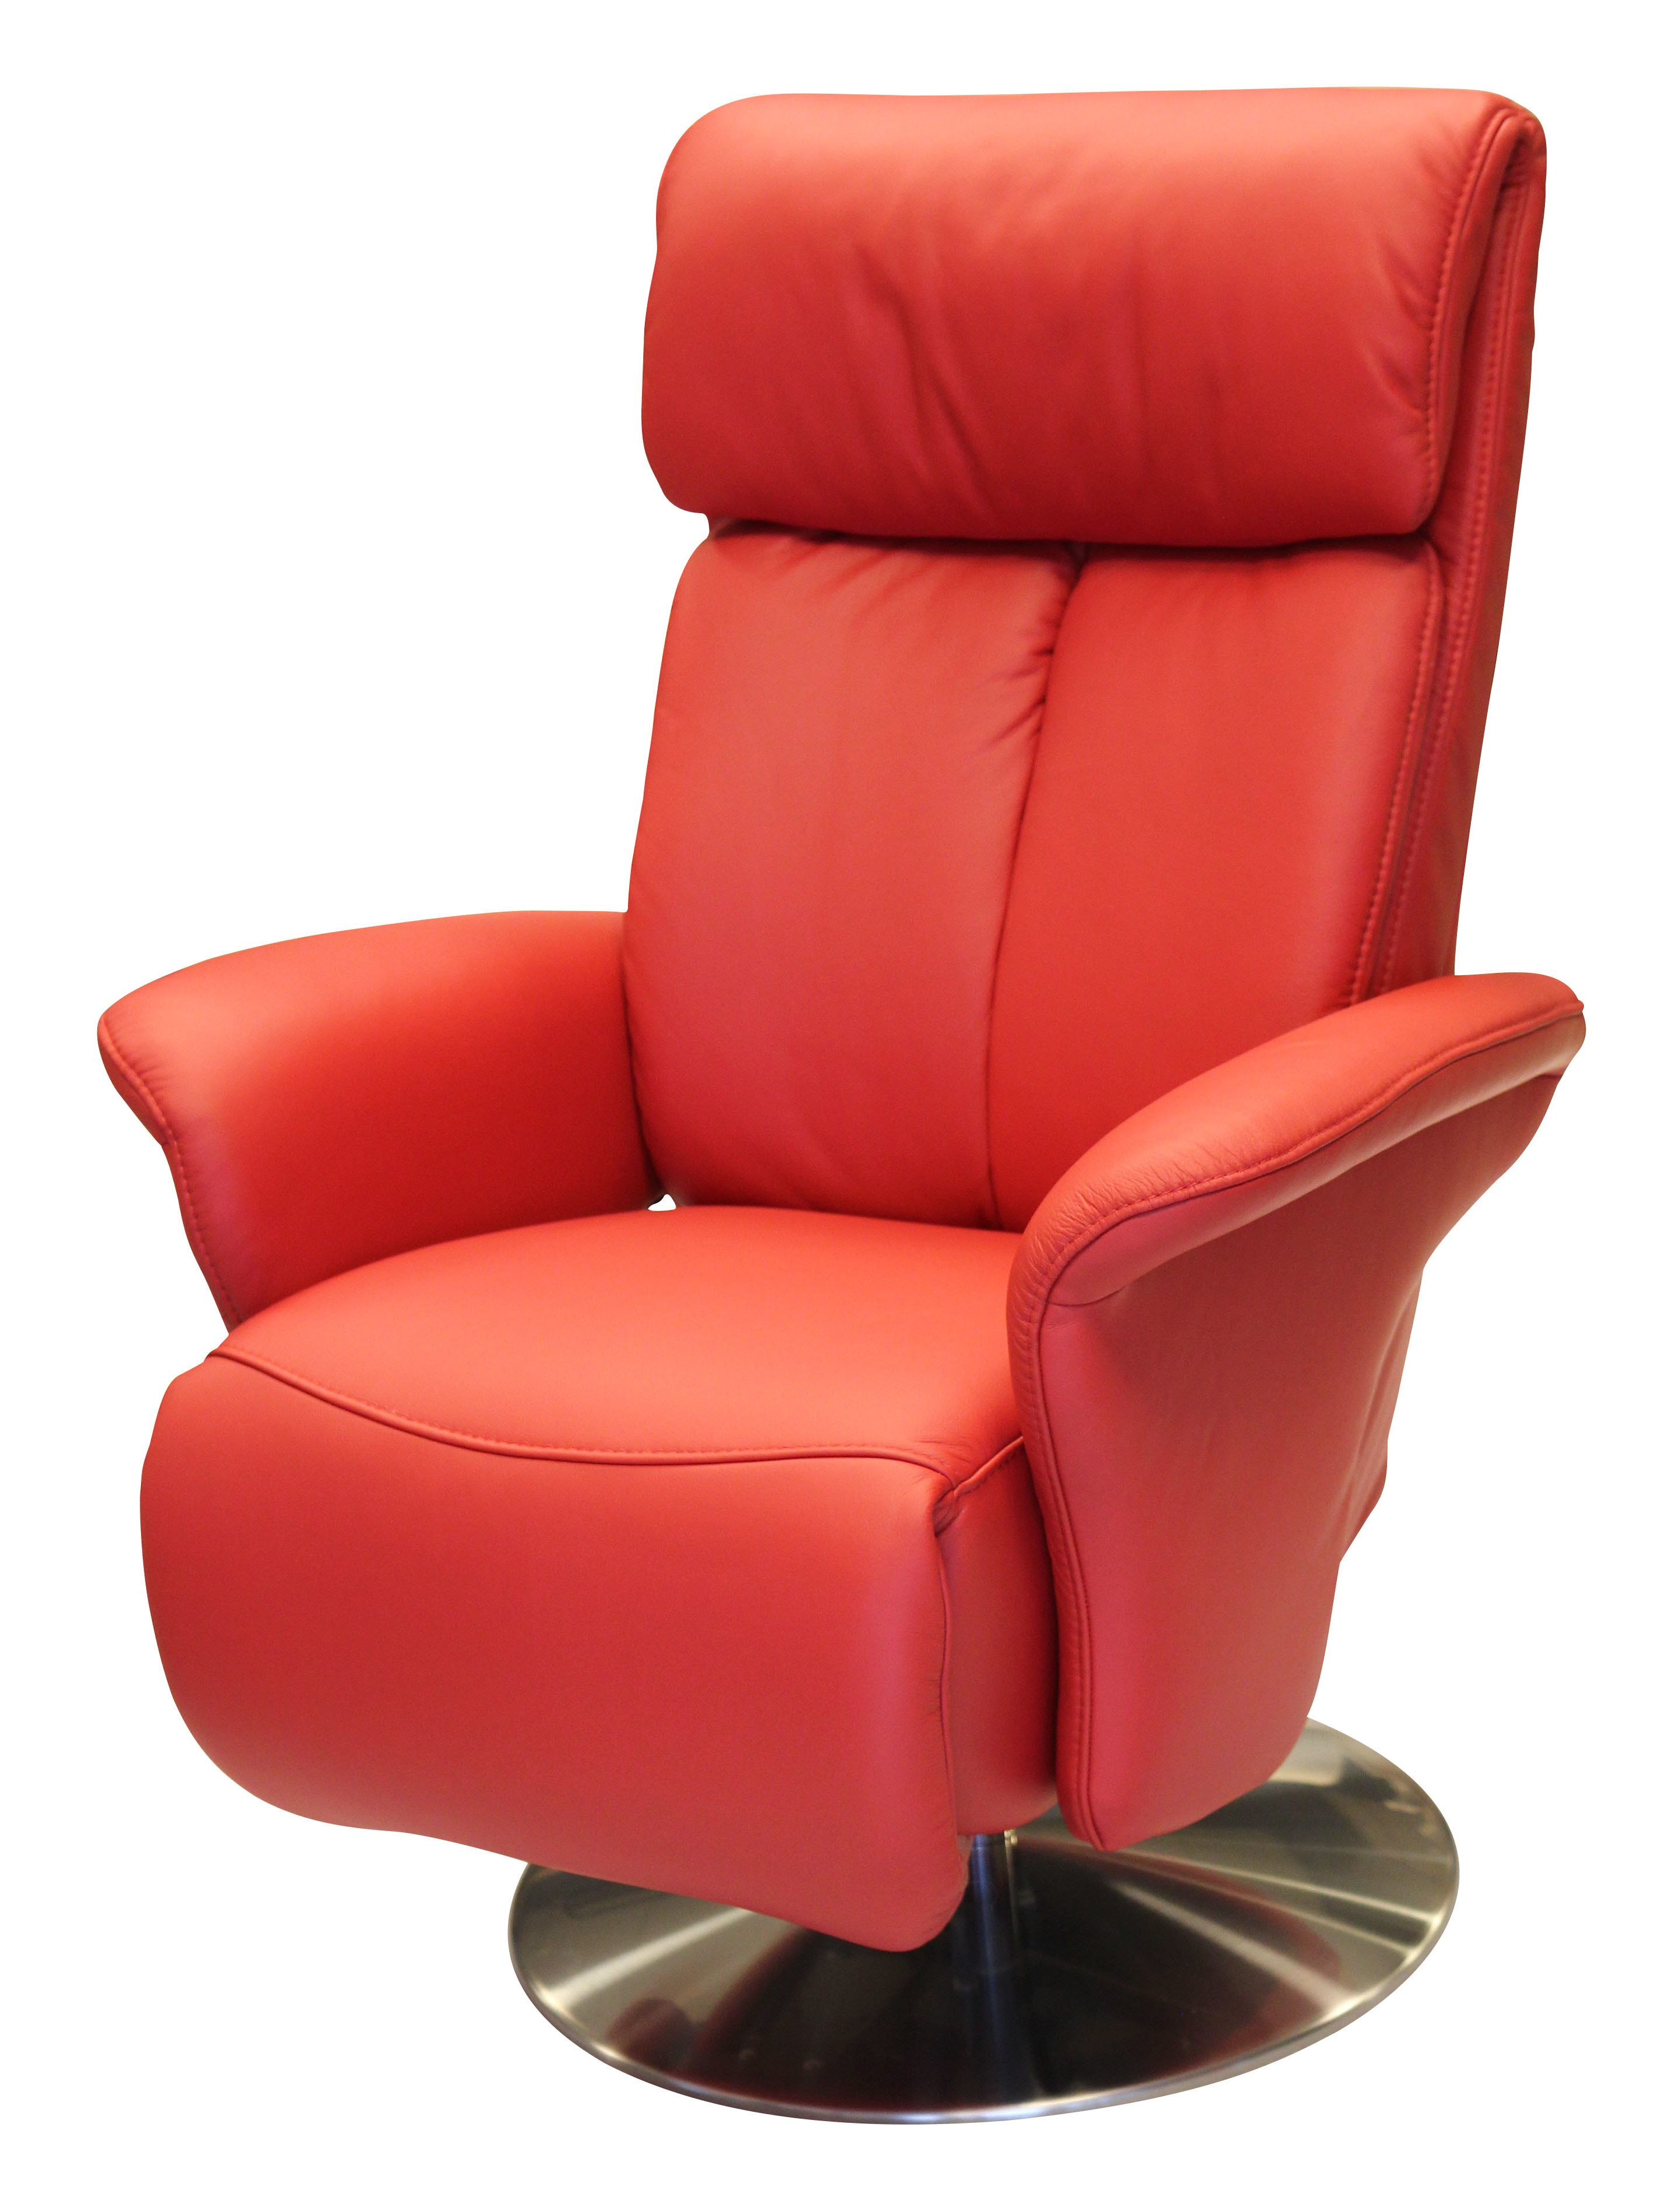 Relaxstoel easysit s50 easysit for Relax stoel